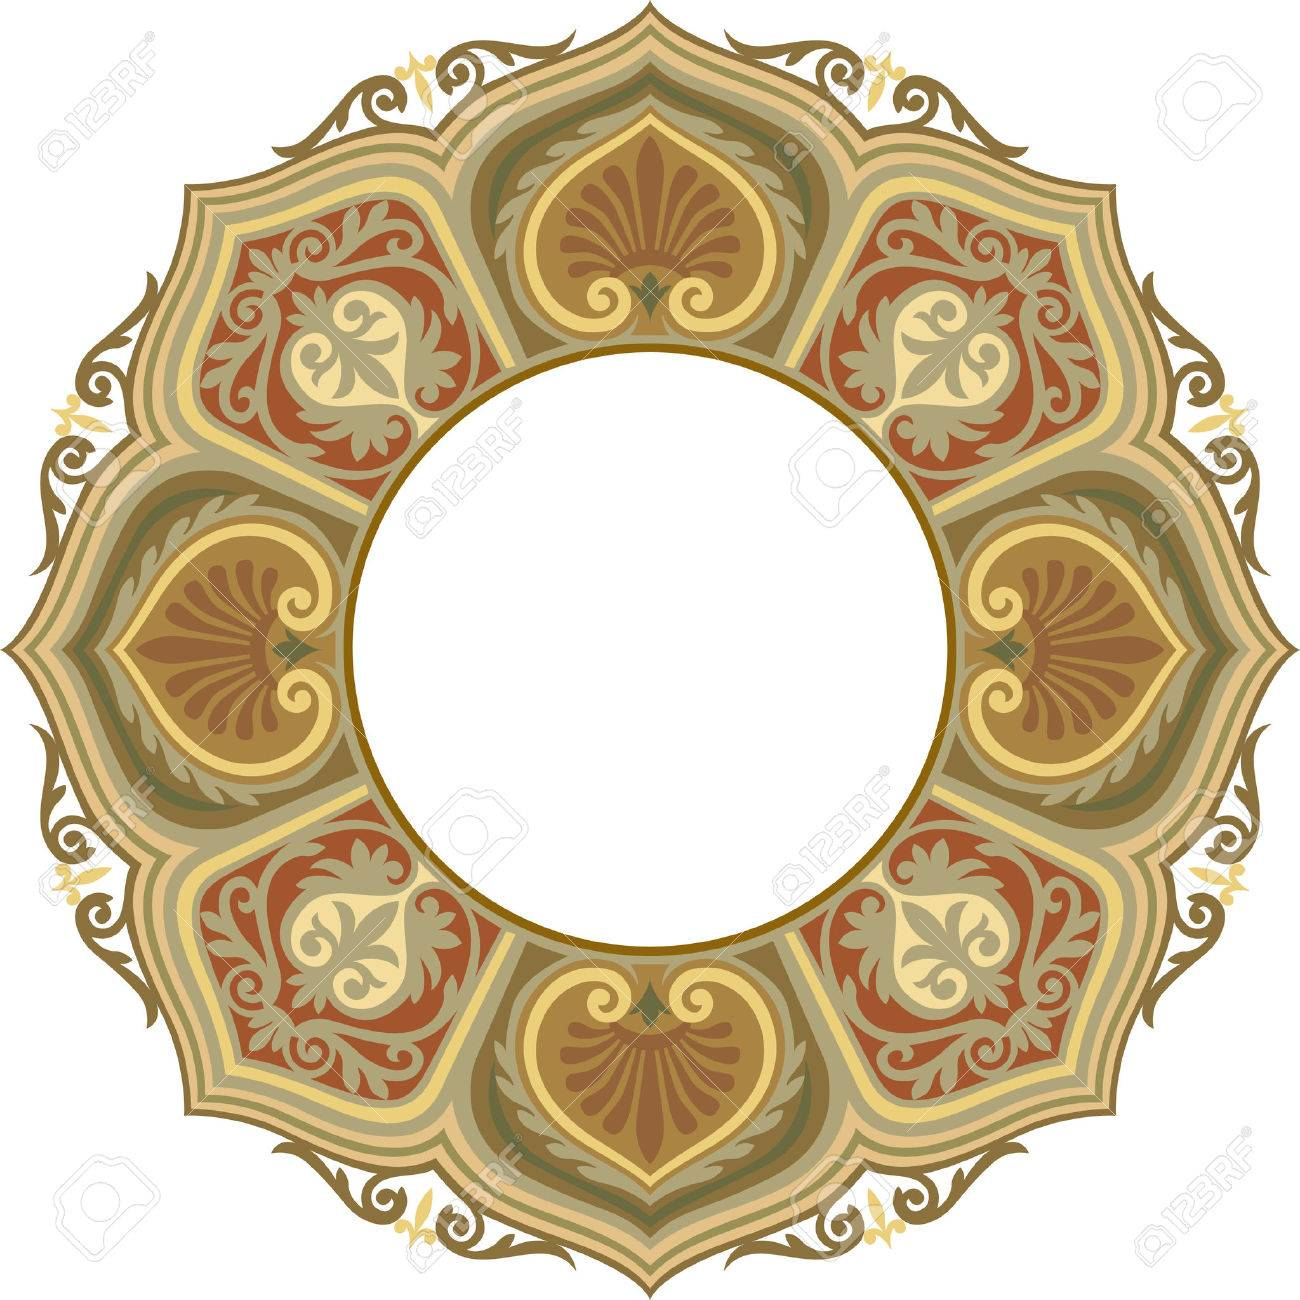 Decorative design element, vector file Stock Vector - 24306773